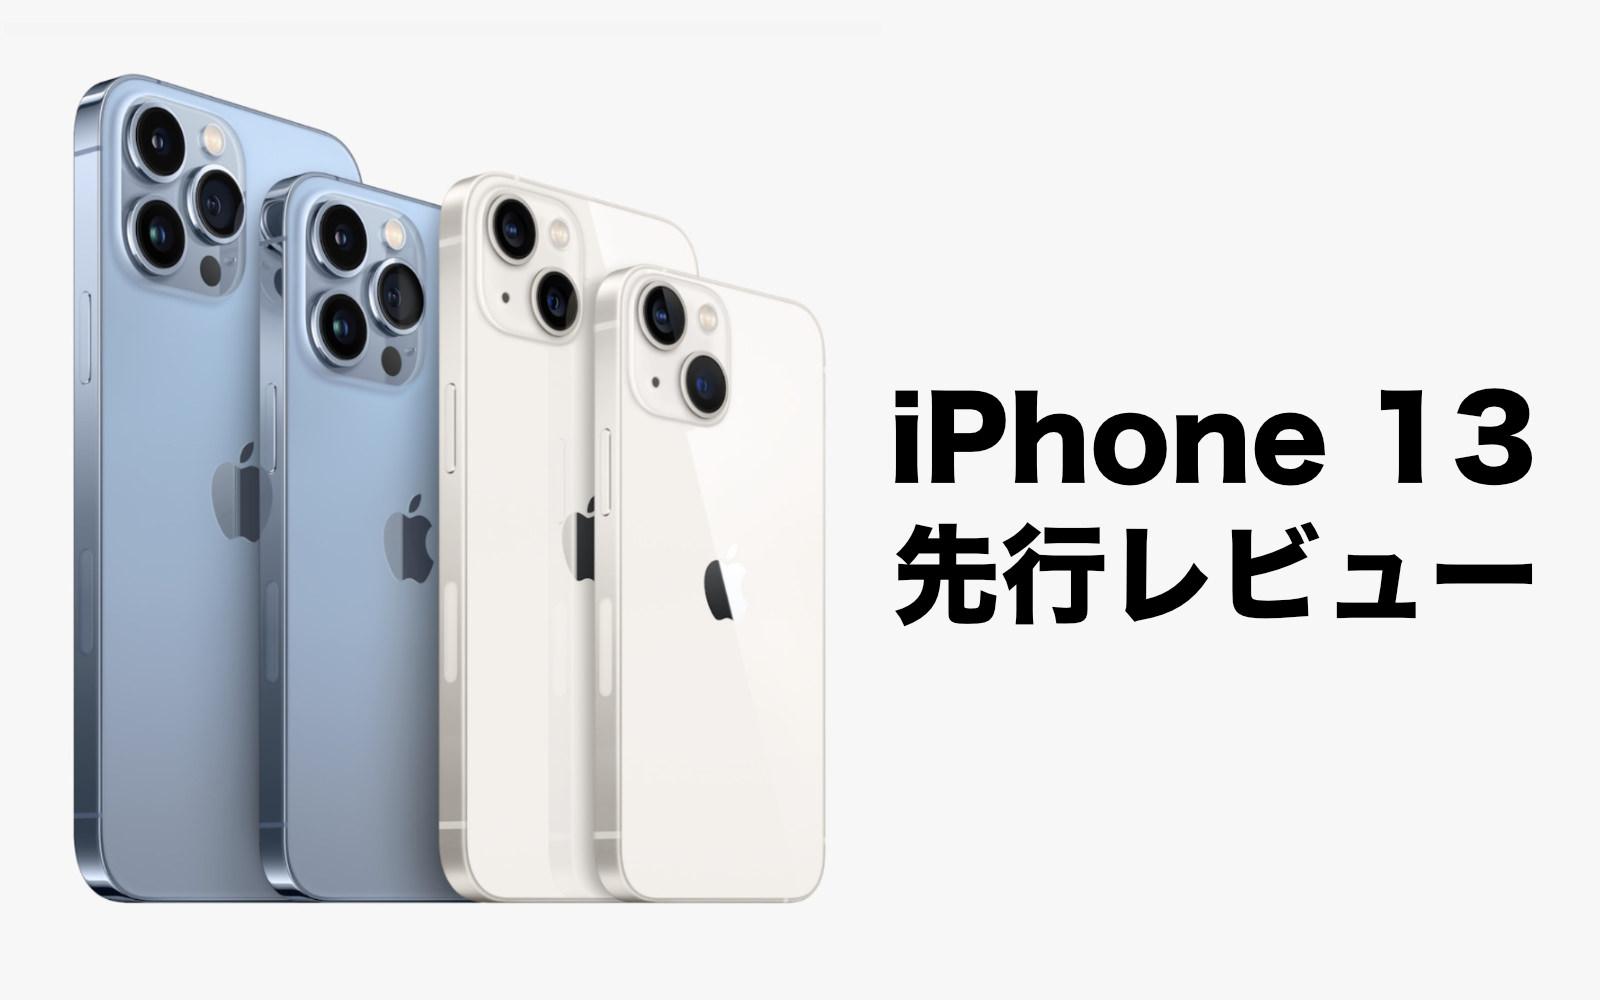 Iphone13 series reviews